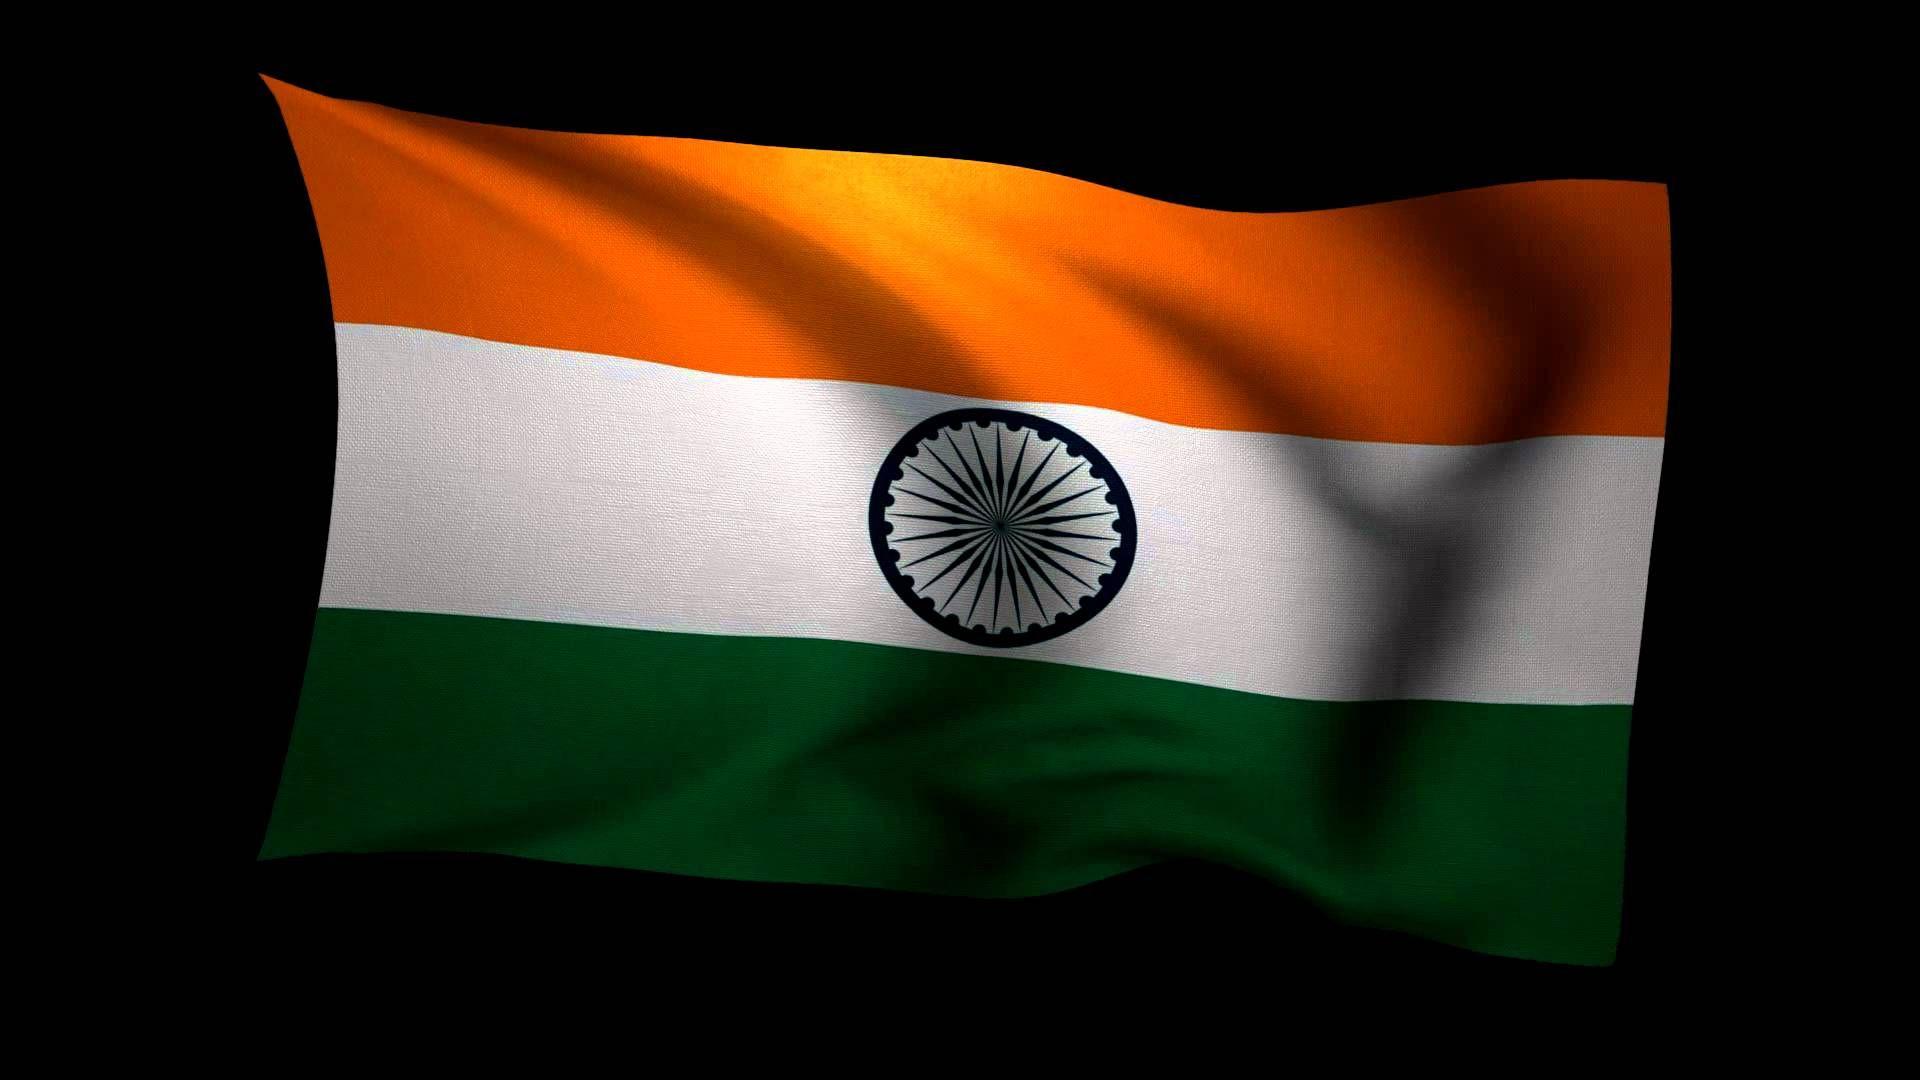 Indian National Flag Wallpaper 3d Wallpapersafari Indian Flag Indian Flag Images Indian Flag Wallpaper